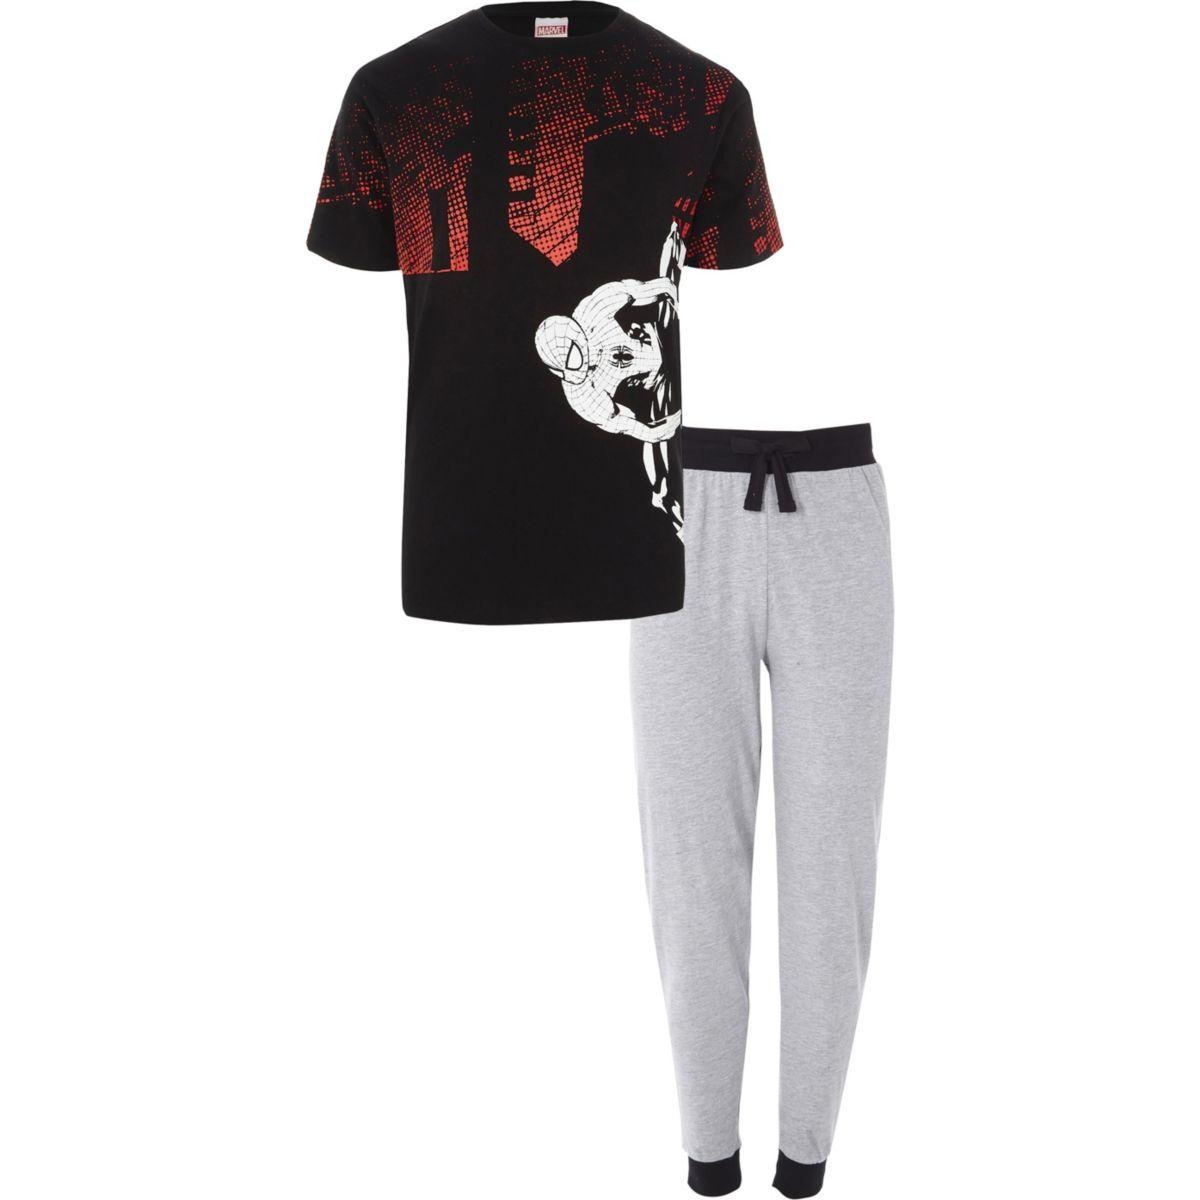 black spiderman print loungewear set pyjamas loungewear